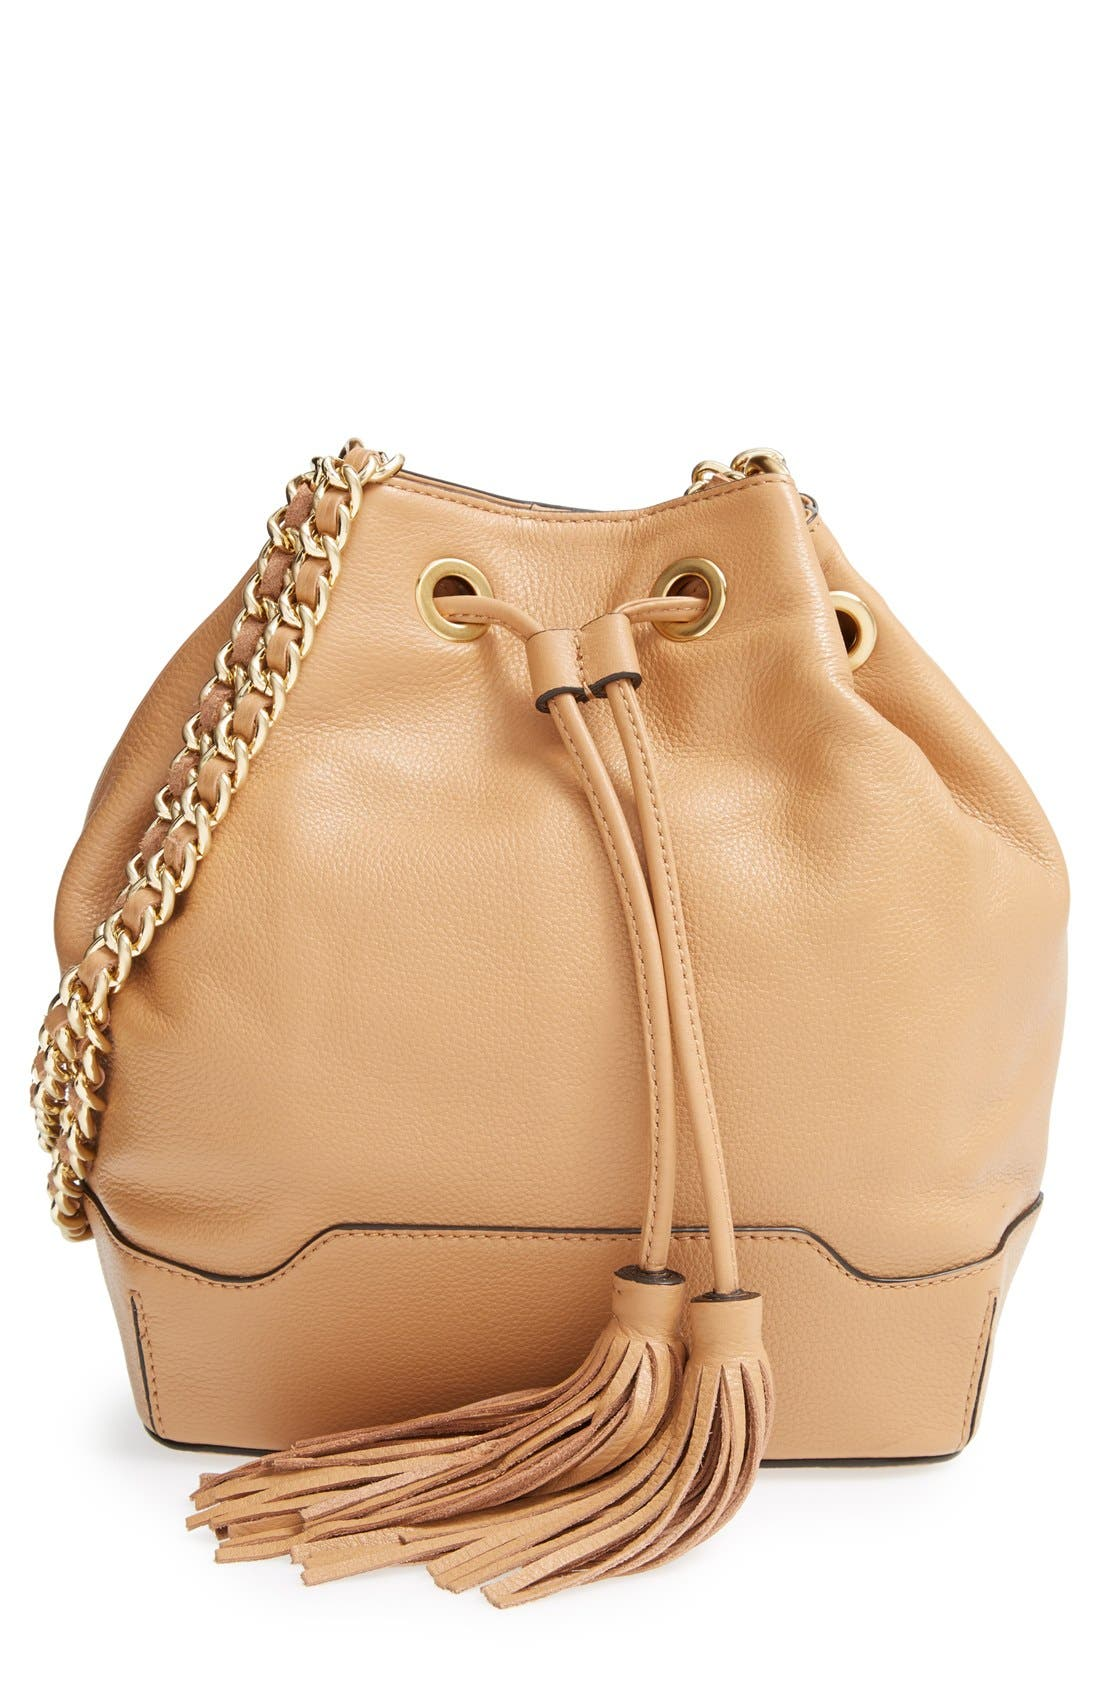 Alternate Image 1 Selected - Rebecca Minkoff 'Lexi' Convertible Bucket Bag